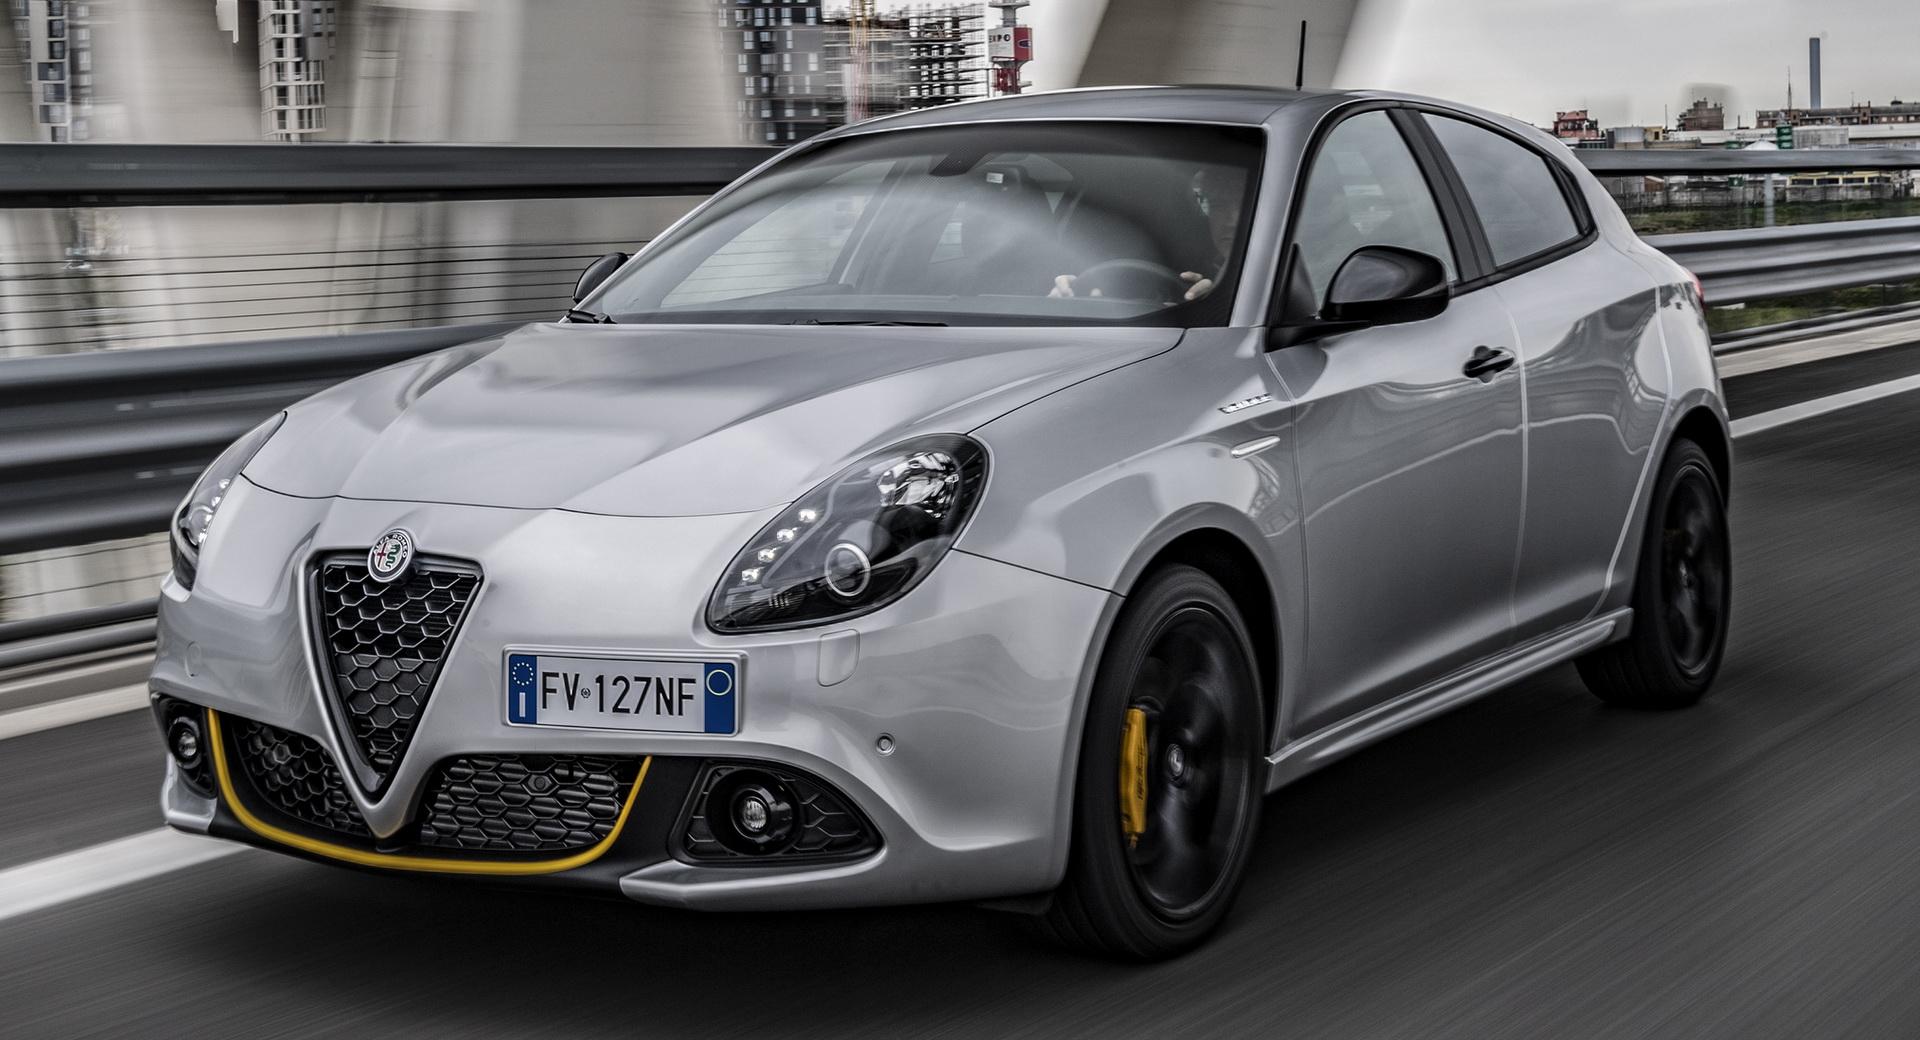 Alfa Romeo está a preparar o fim do Giulietta já na Primavera